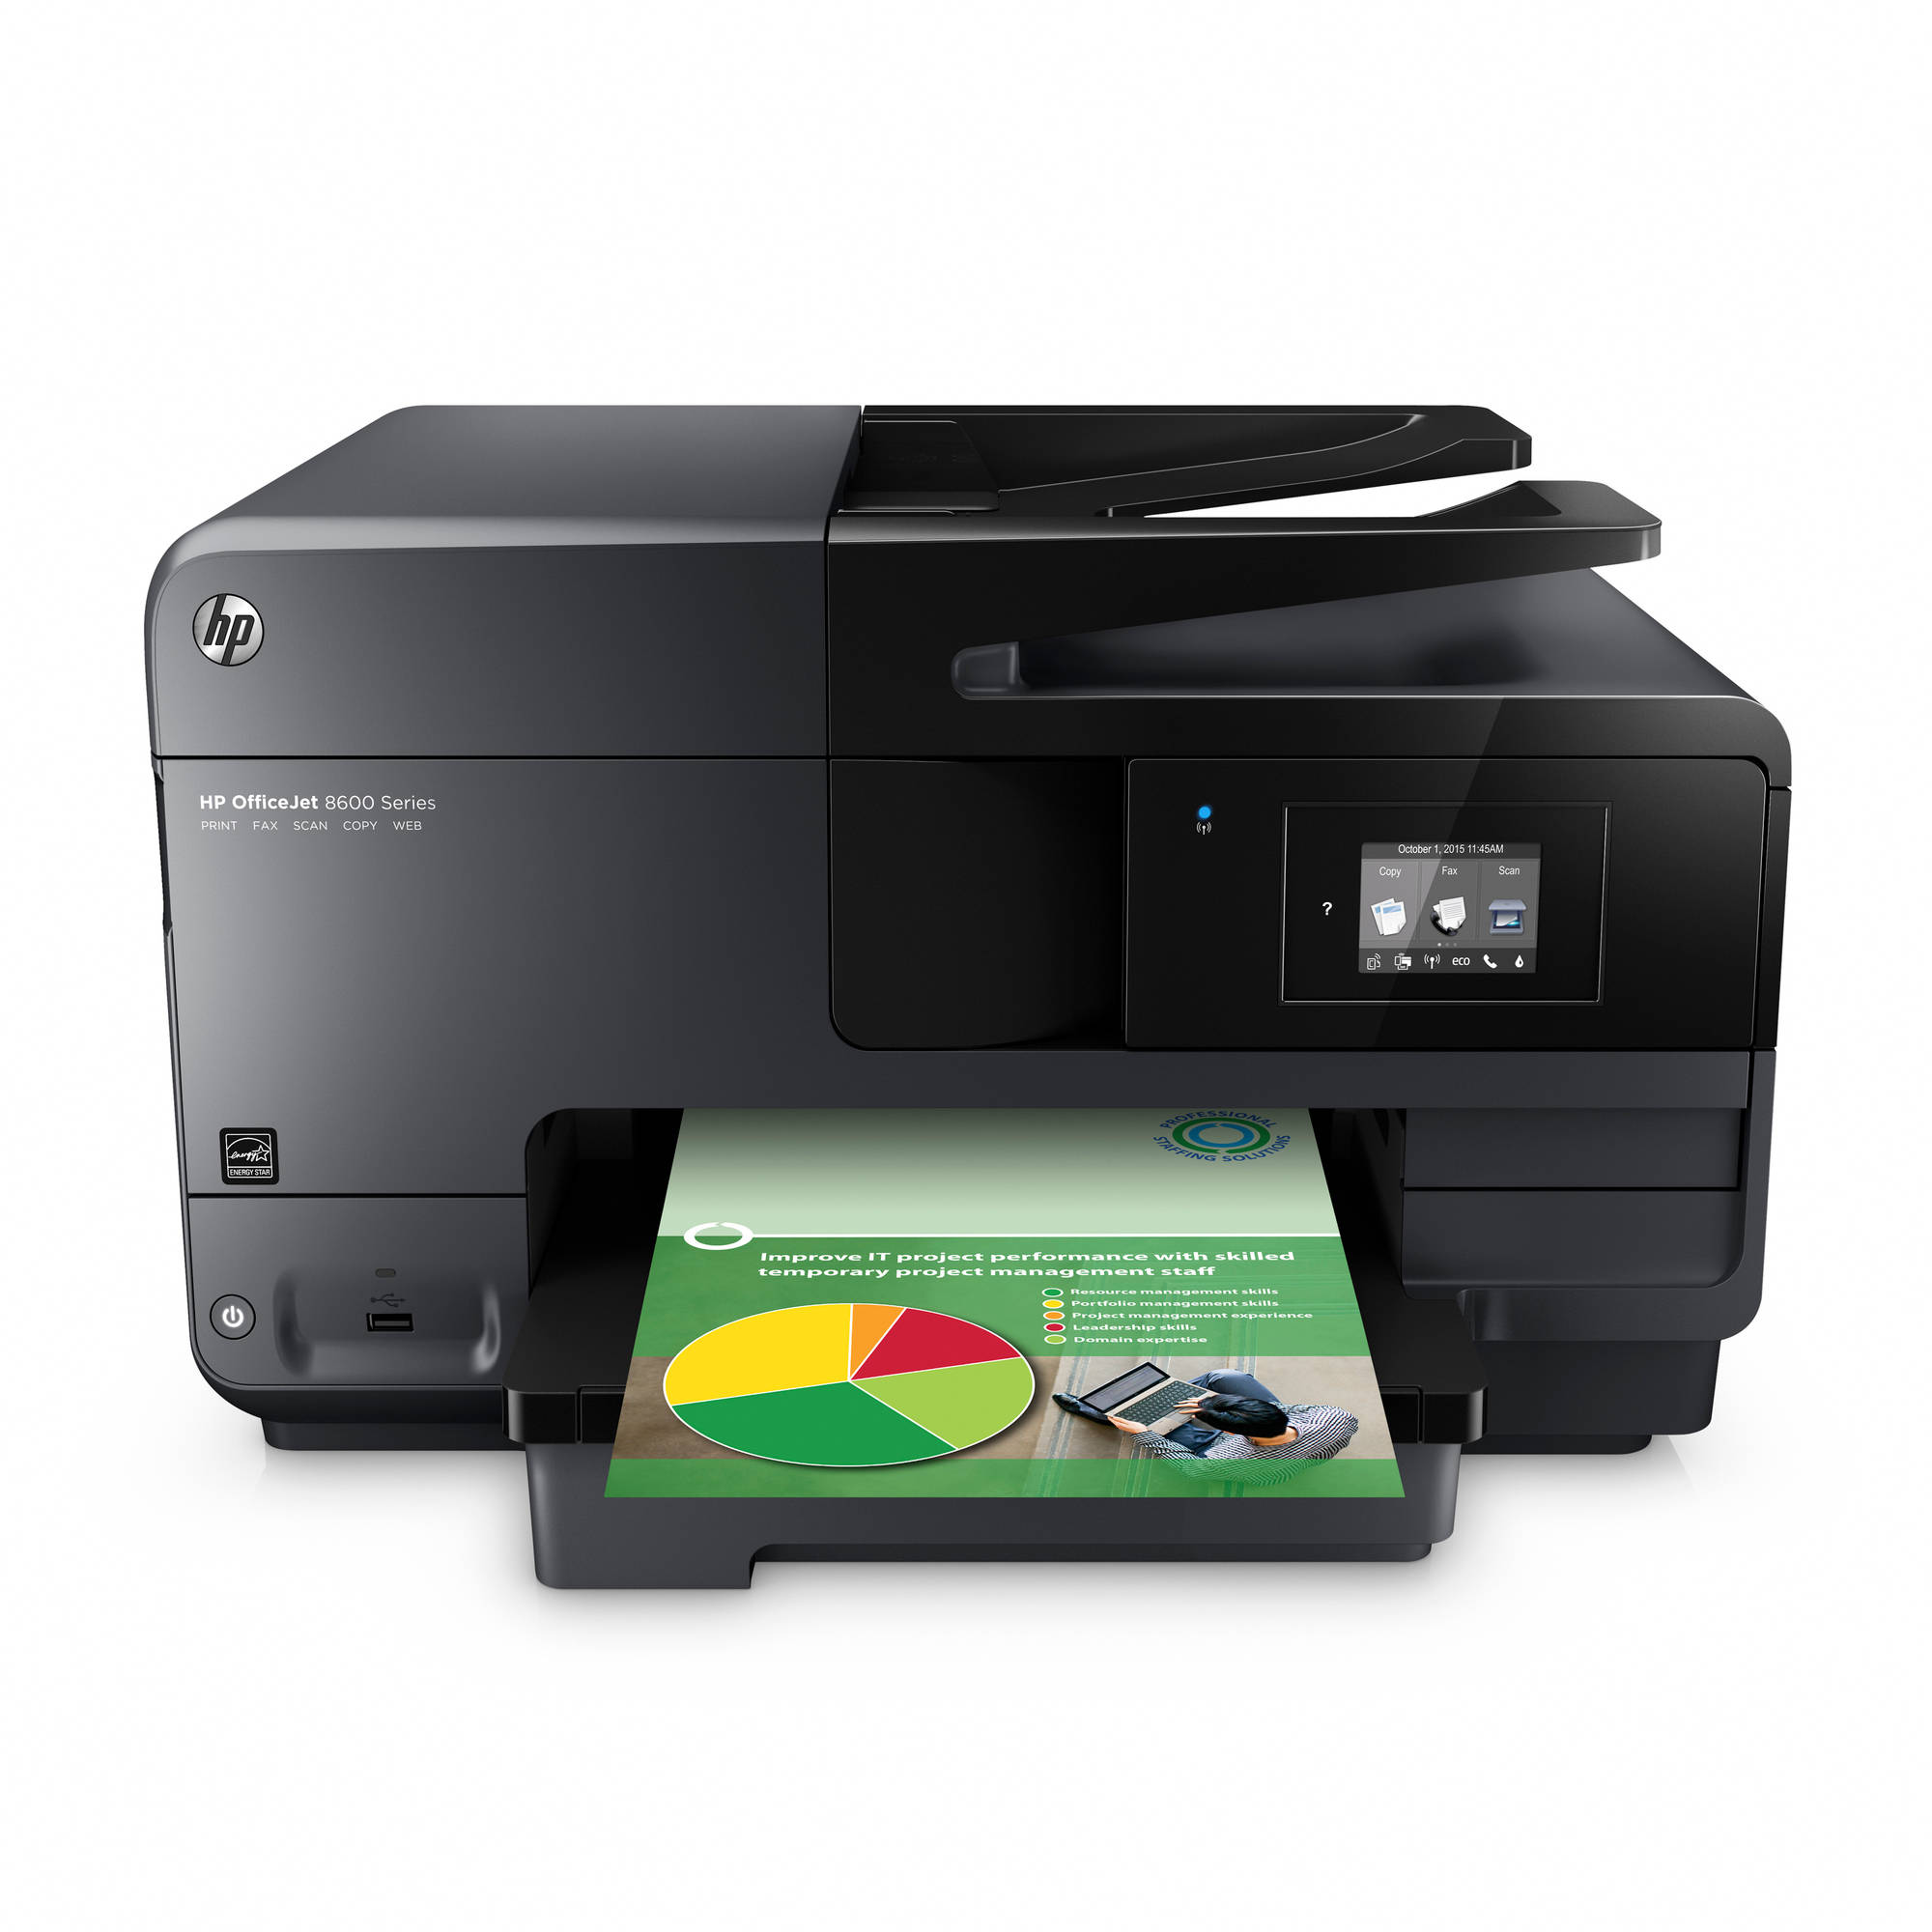 HP OfficeJet 8600 Inkjet e-All-in-One Multifunction Printer/Copier/Scanner/Fax Machine